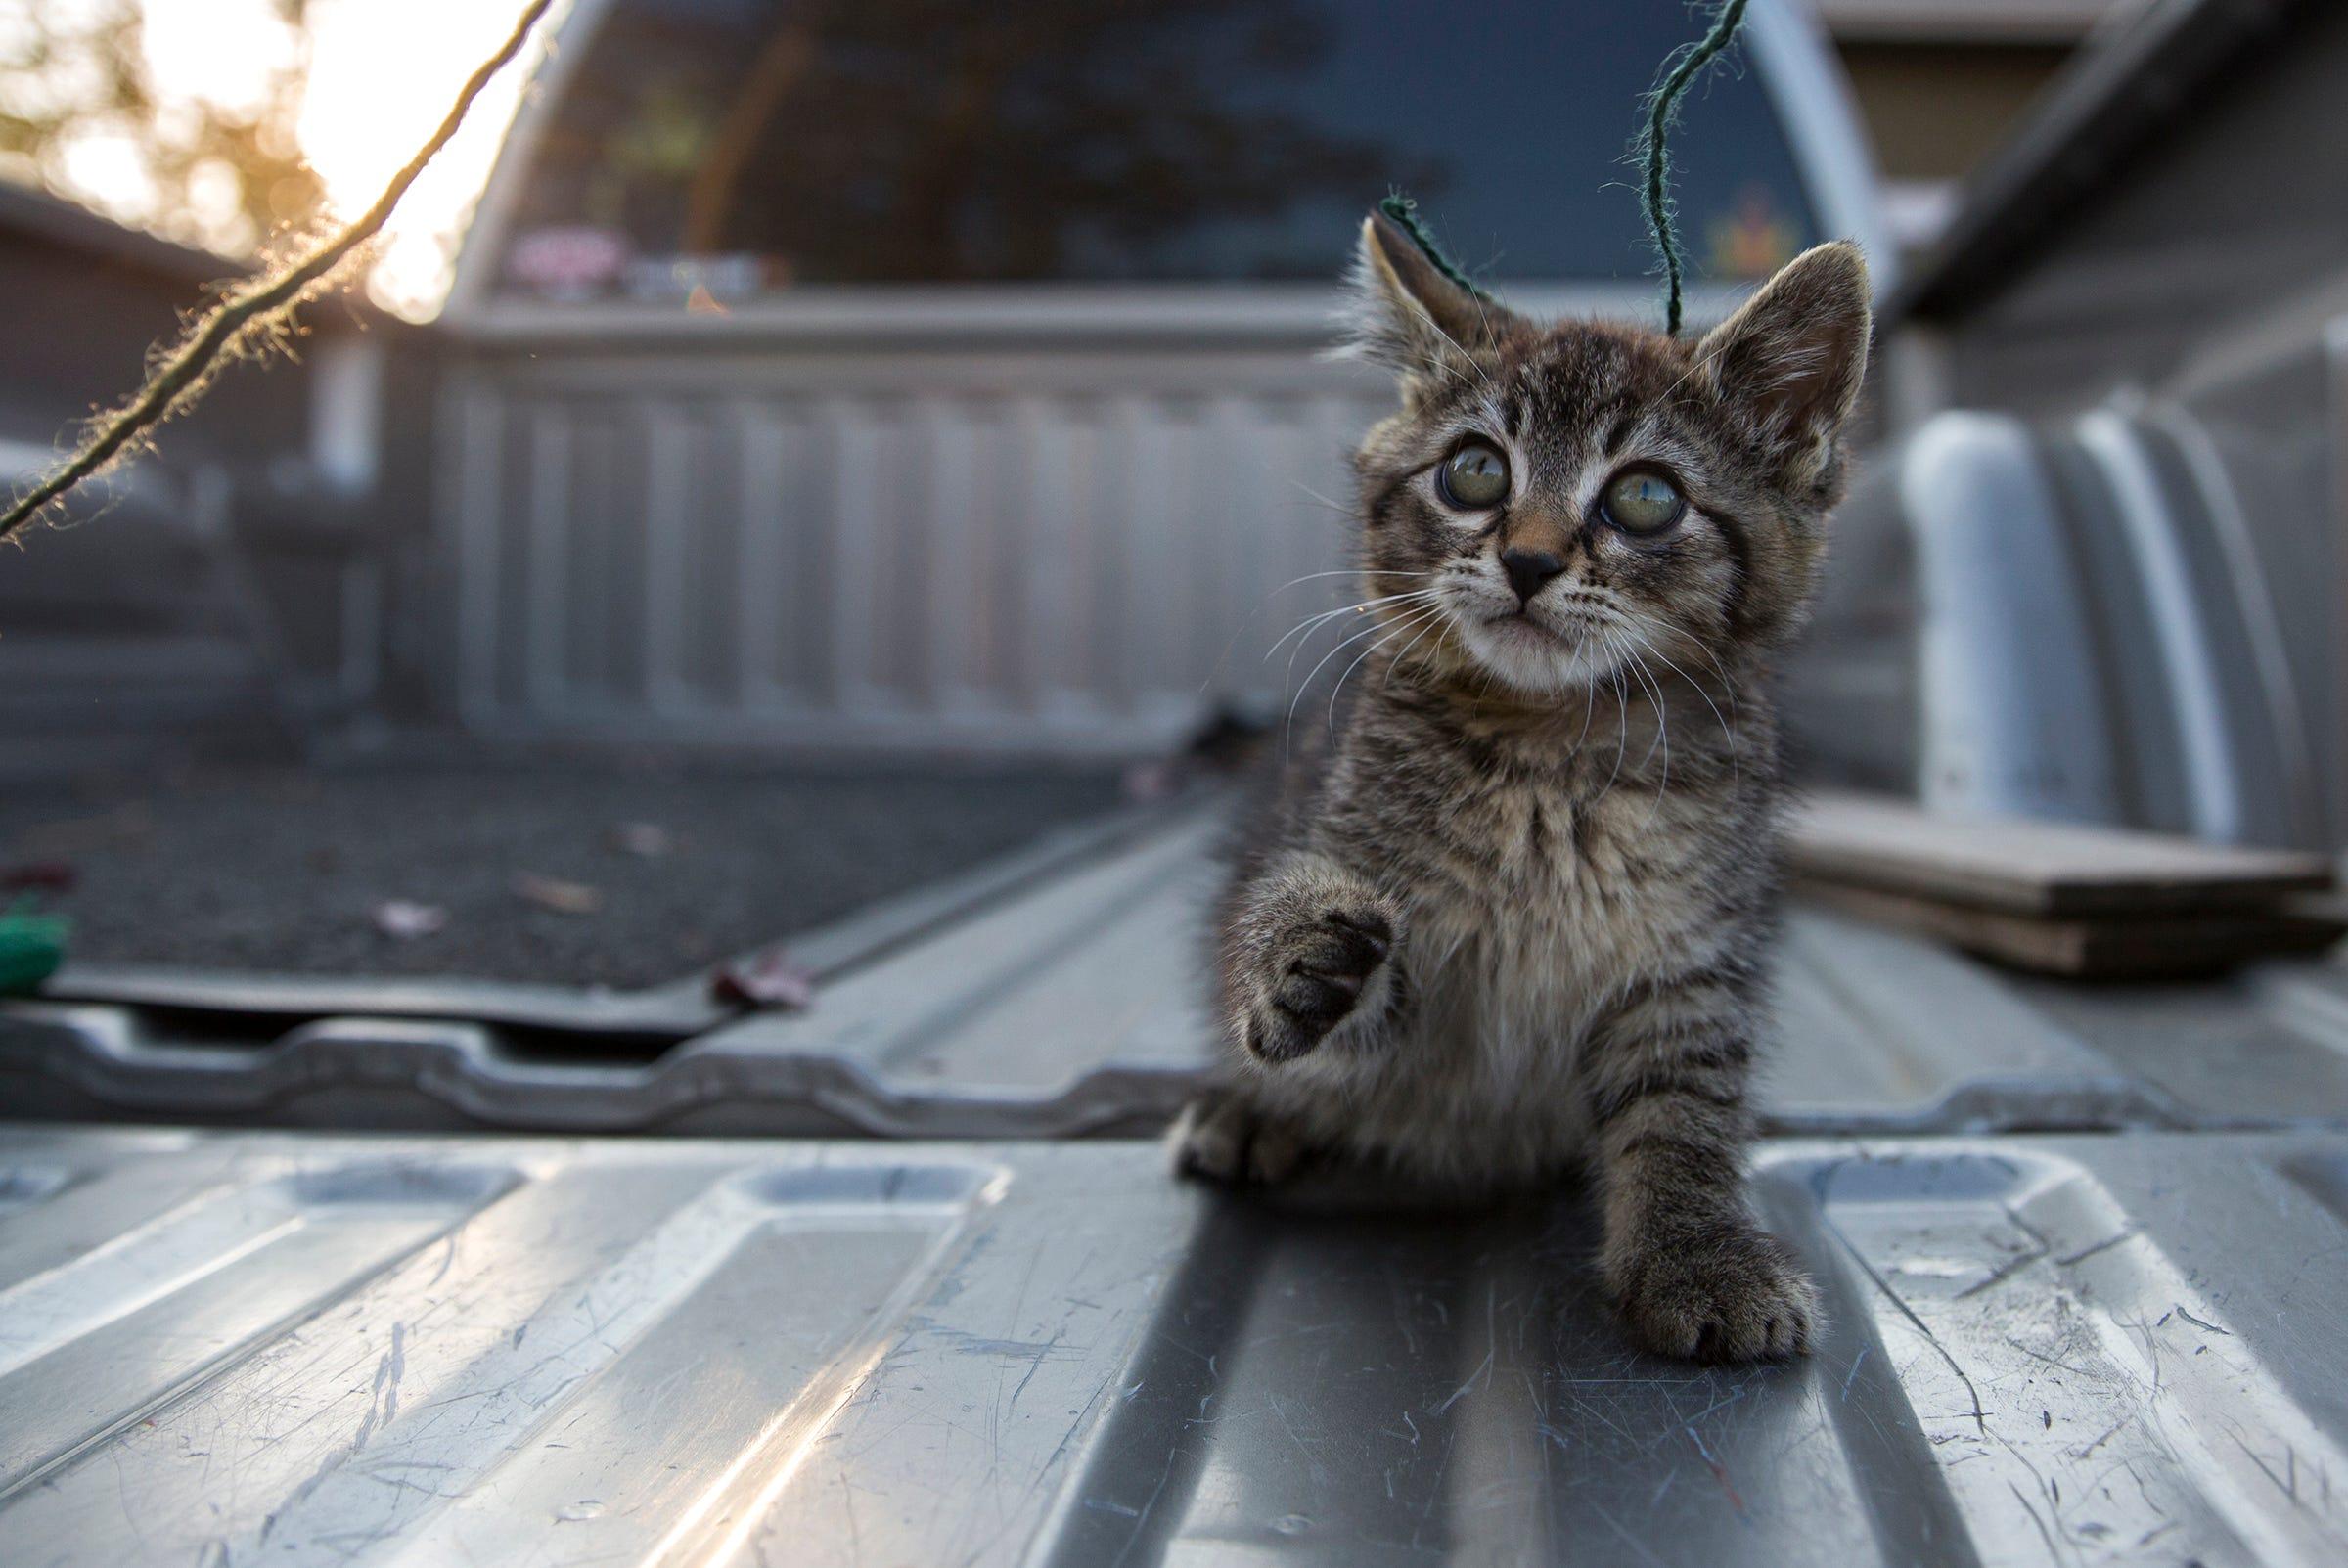 That Sticky Cat